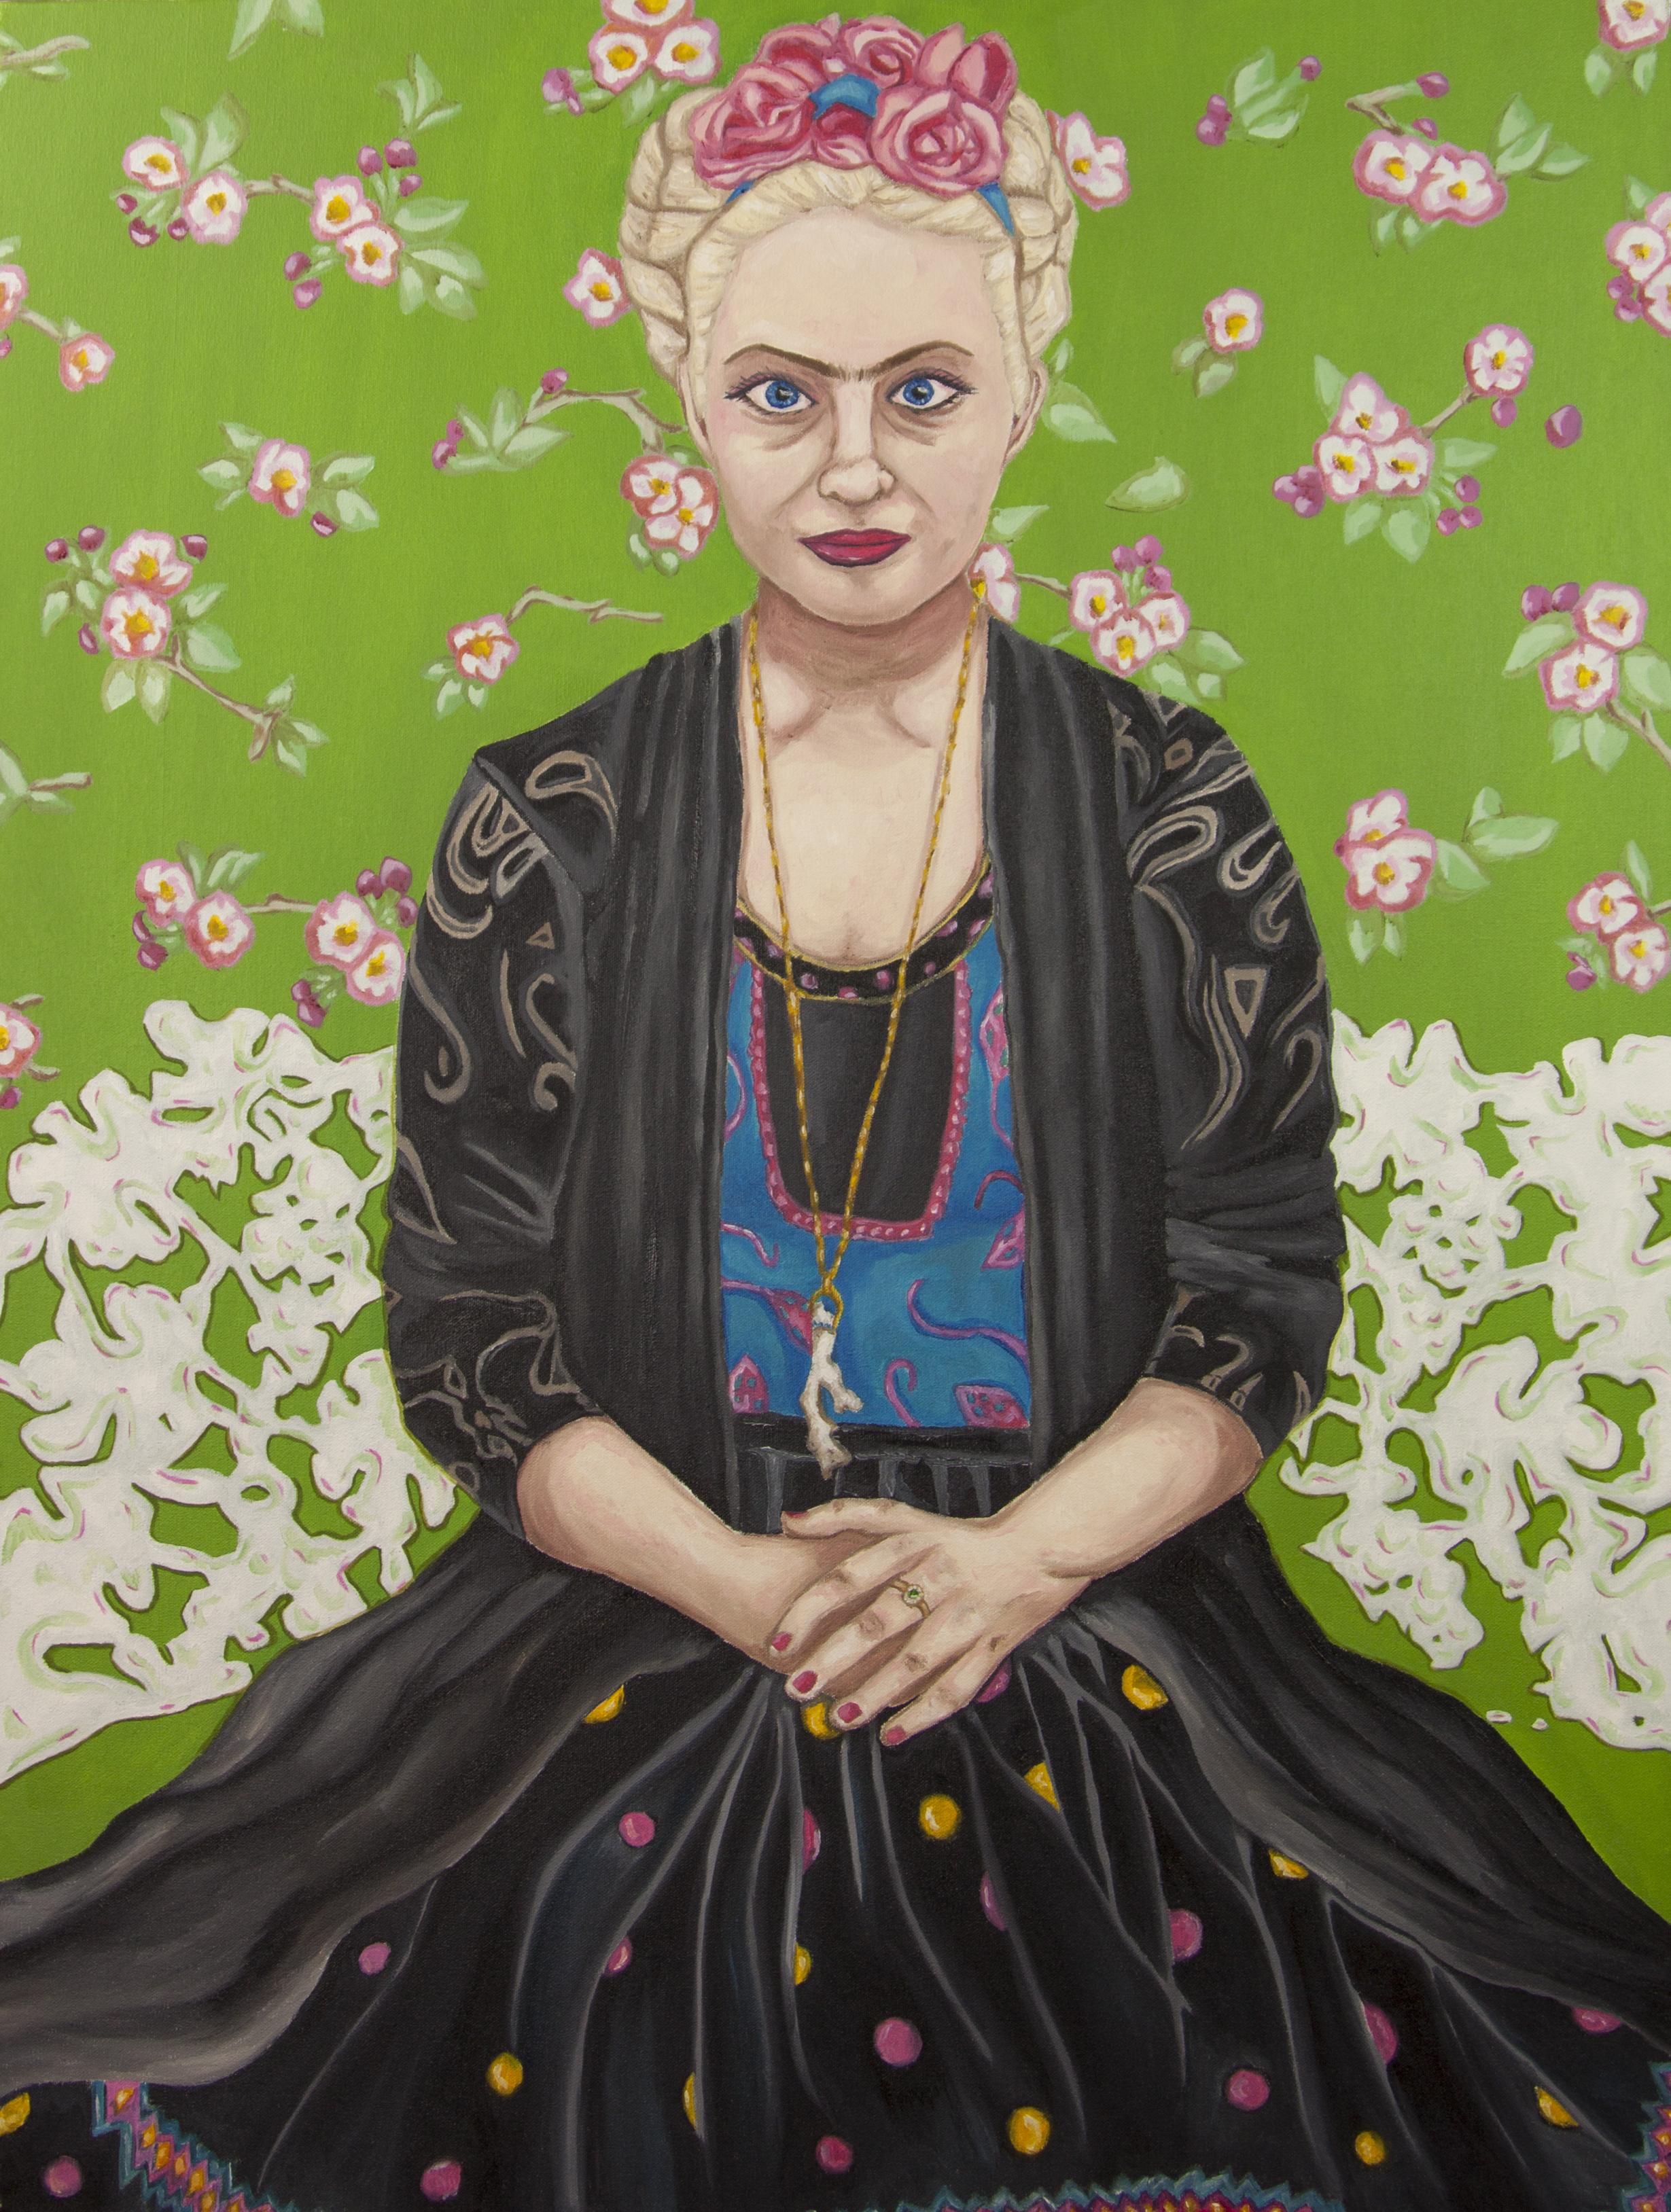 Self-Portrait As Frida Kahlo